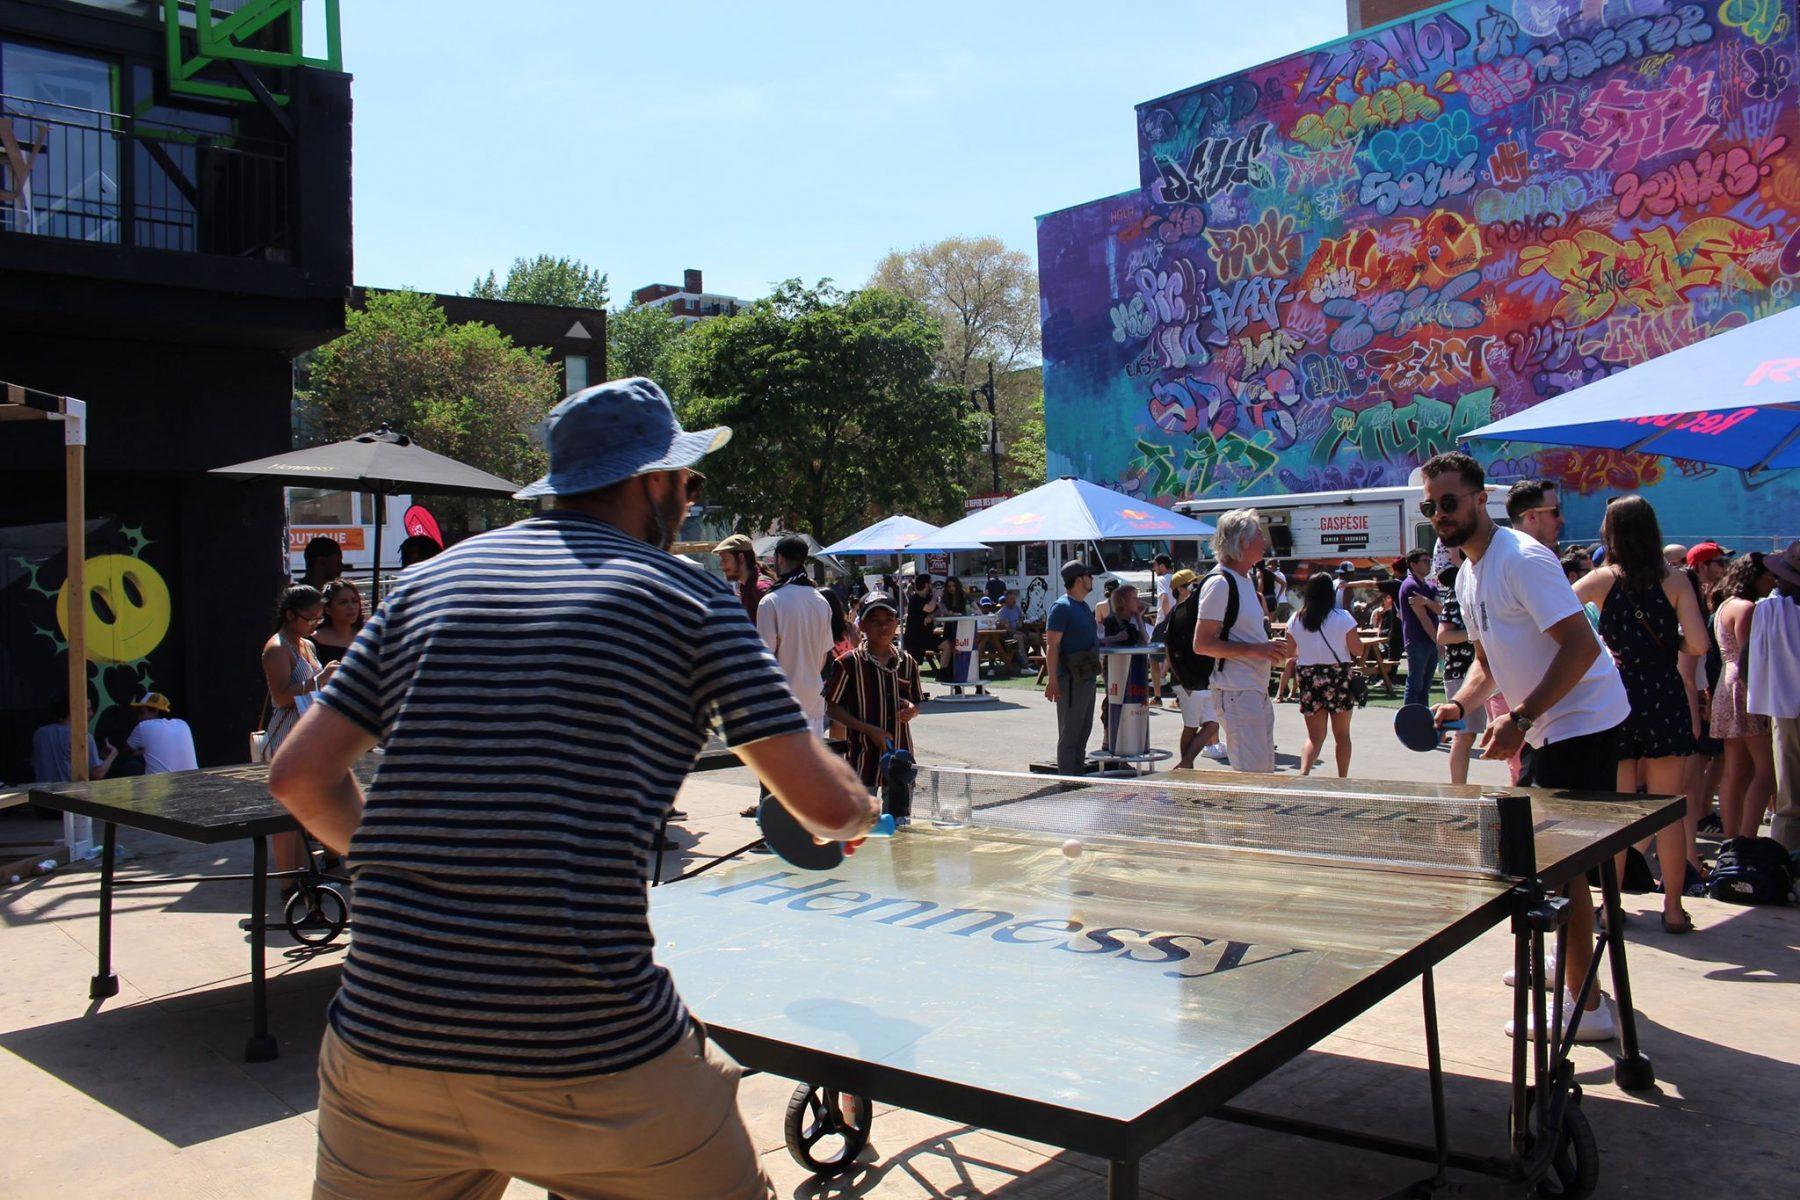 mural-festival-arts-montreal-ping-pong